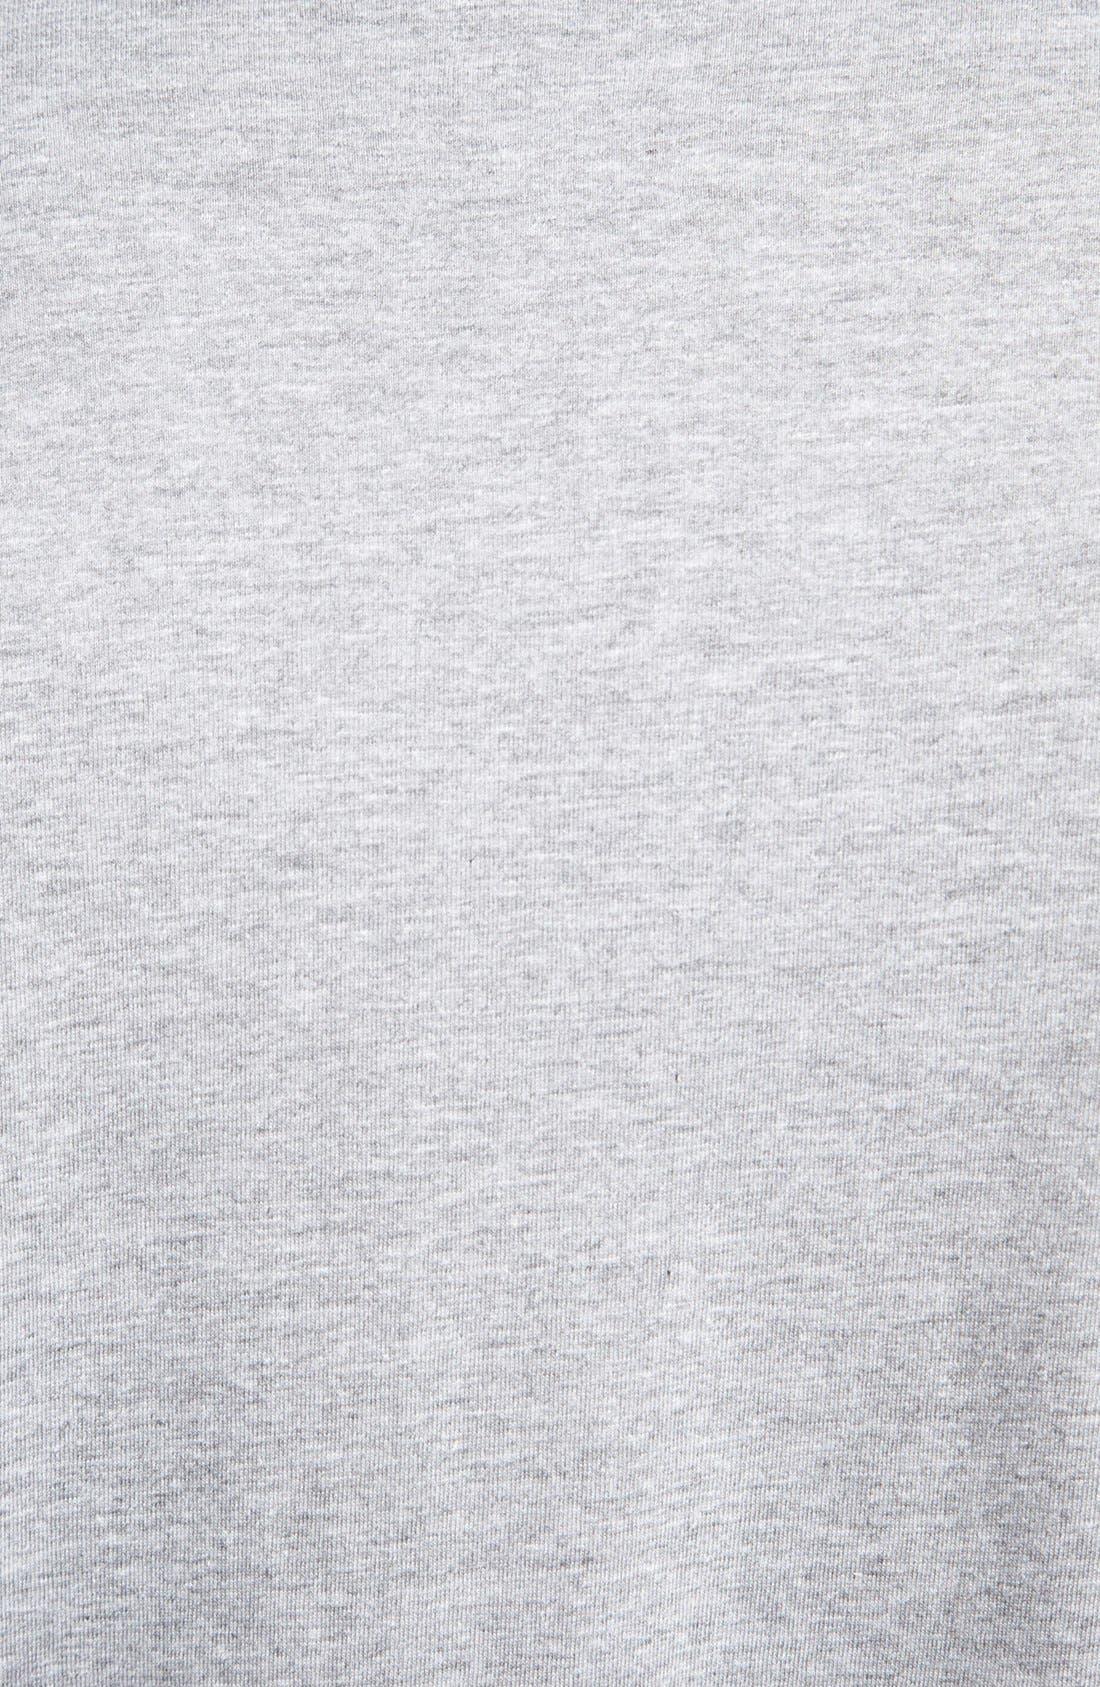 Alternate Image 3  - Horses Cut Shop 'Moby Dick's' T-Shirt